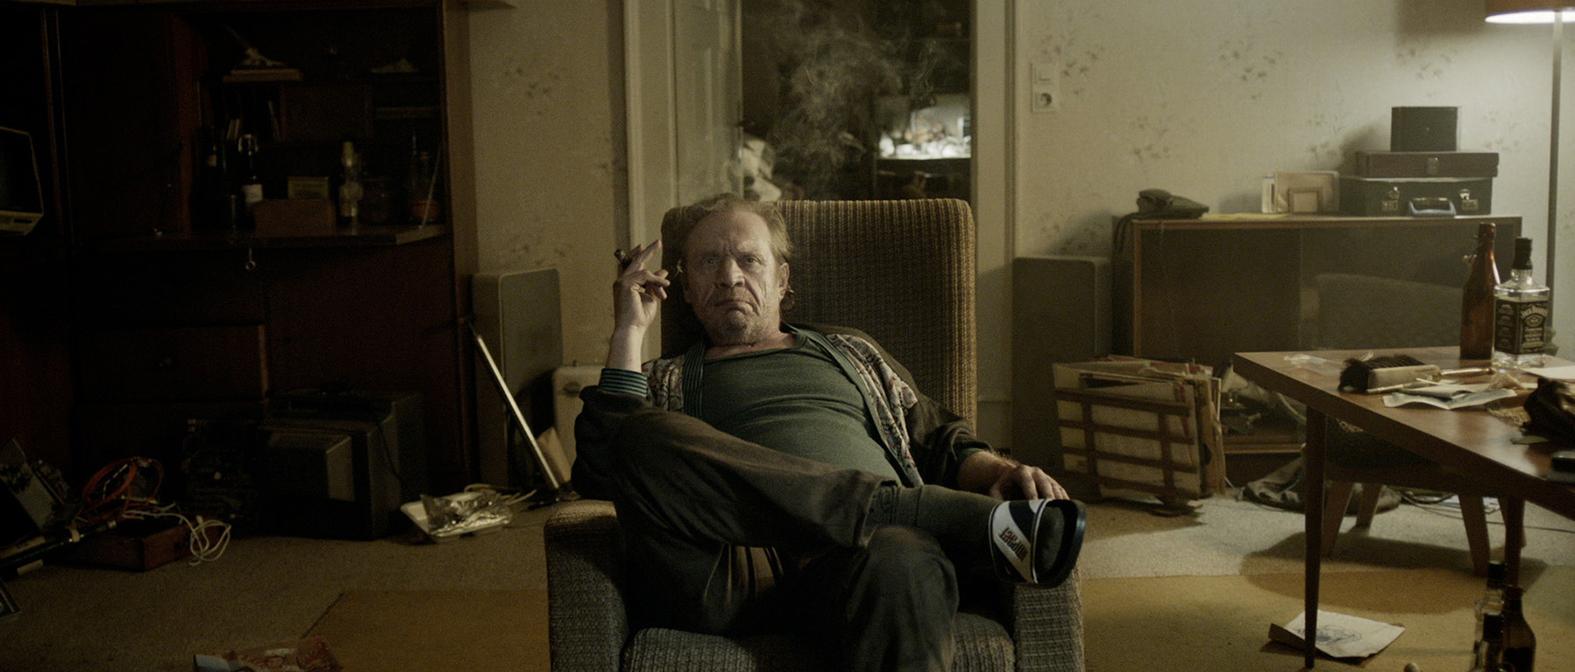 Trash Detective: Uwe (Rudolf Waldemar Brem) zu Hause (c) DOMAR Film GmbH